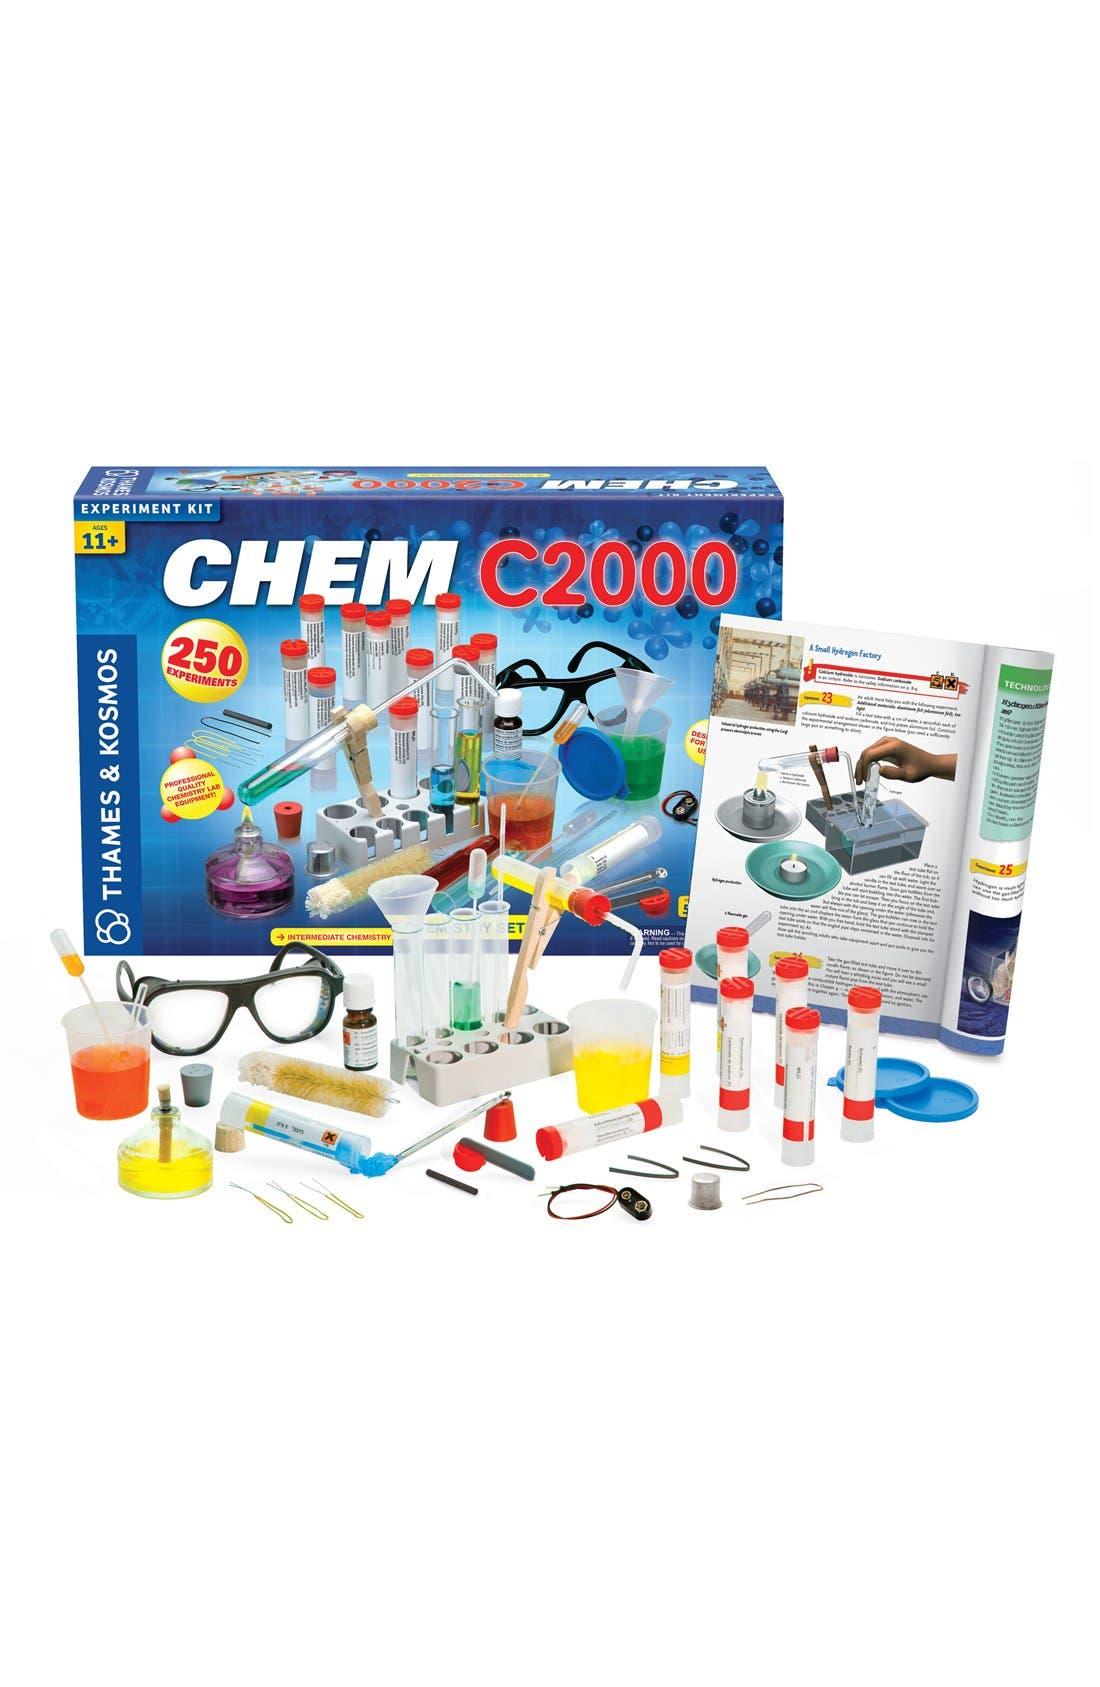 'CHEM C2000 (V 2.0)' Experiment Kit,                             Main thumbnail 1, color,                             NO COLOR